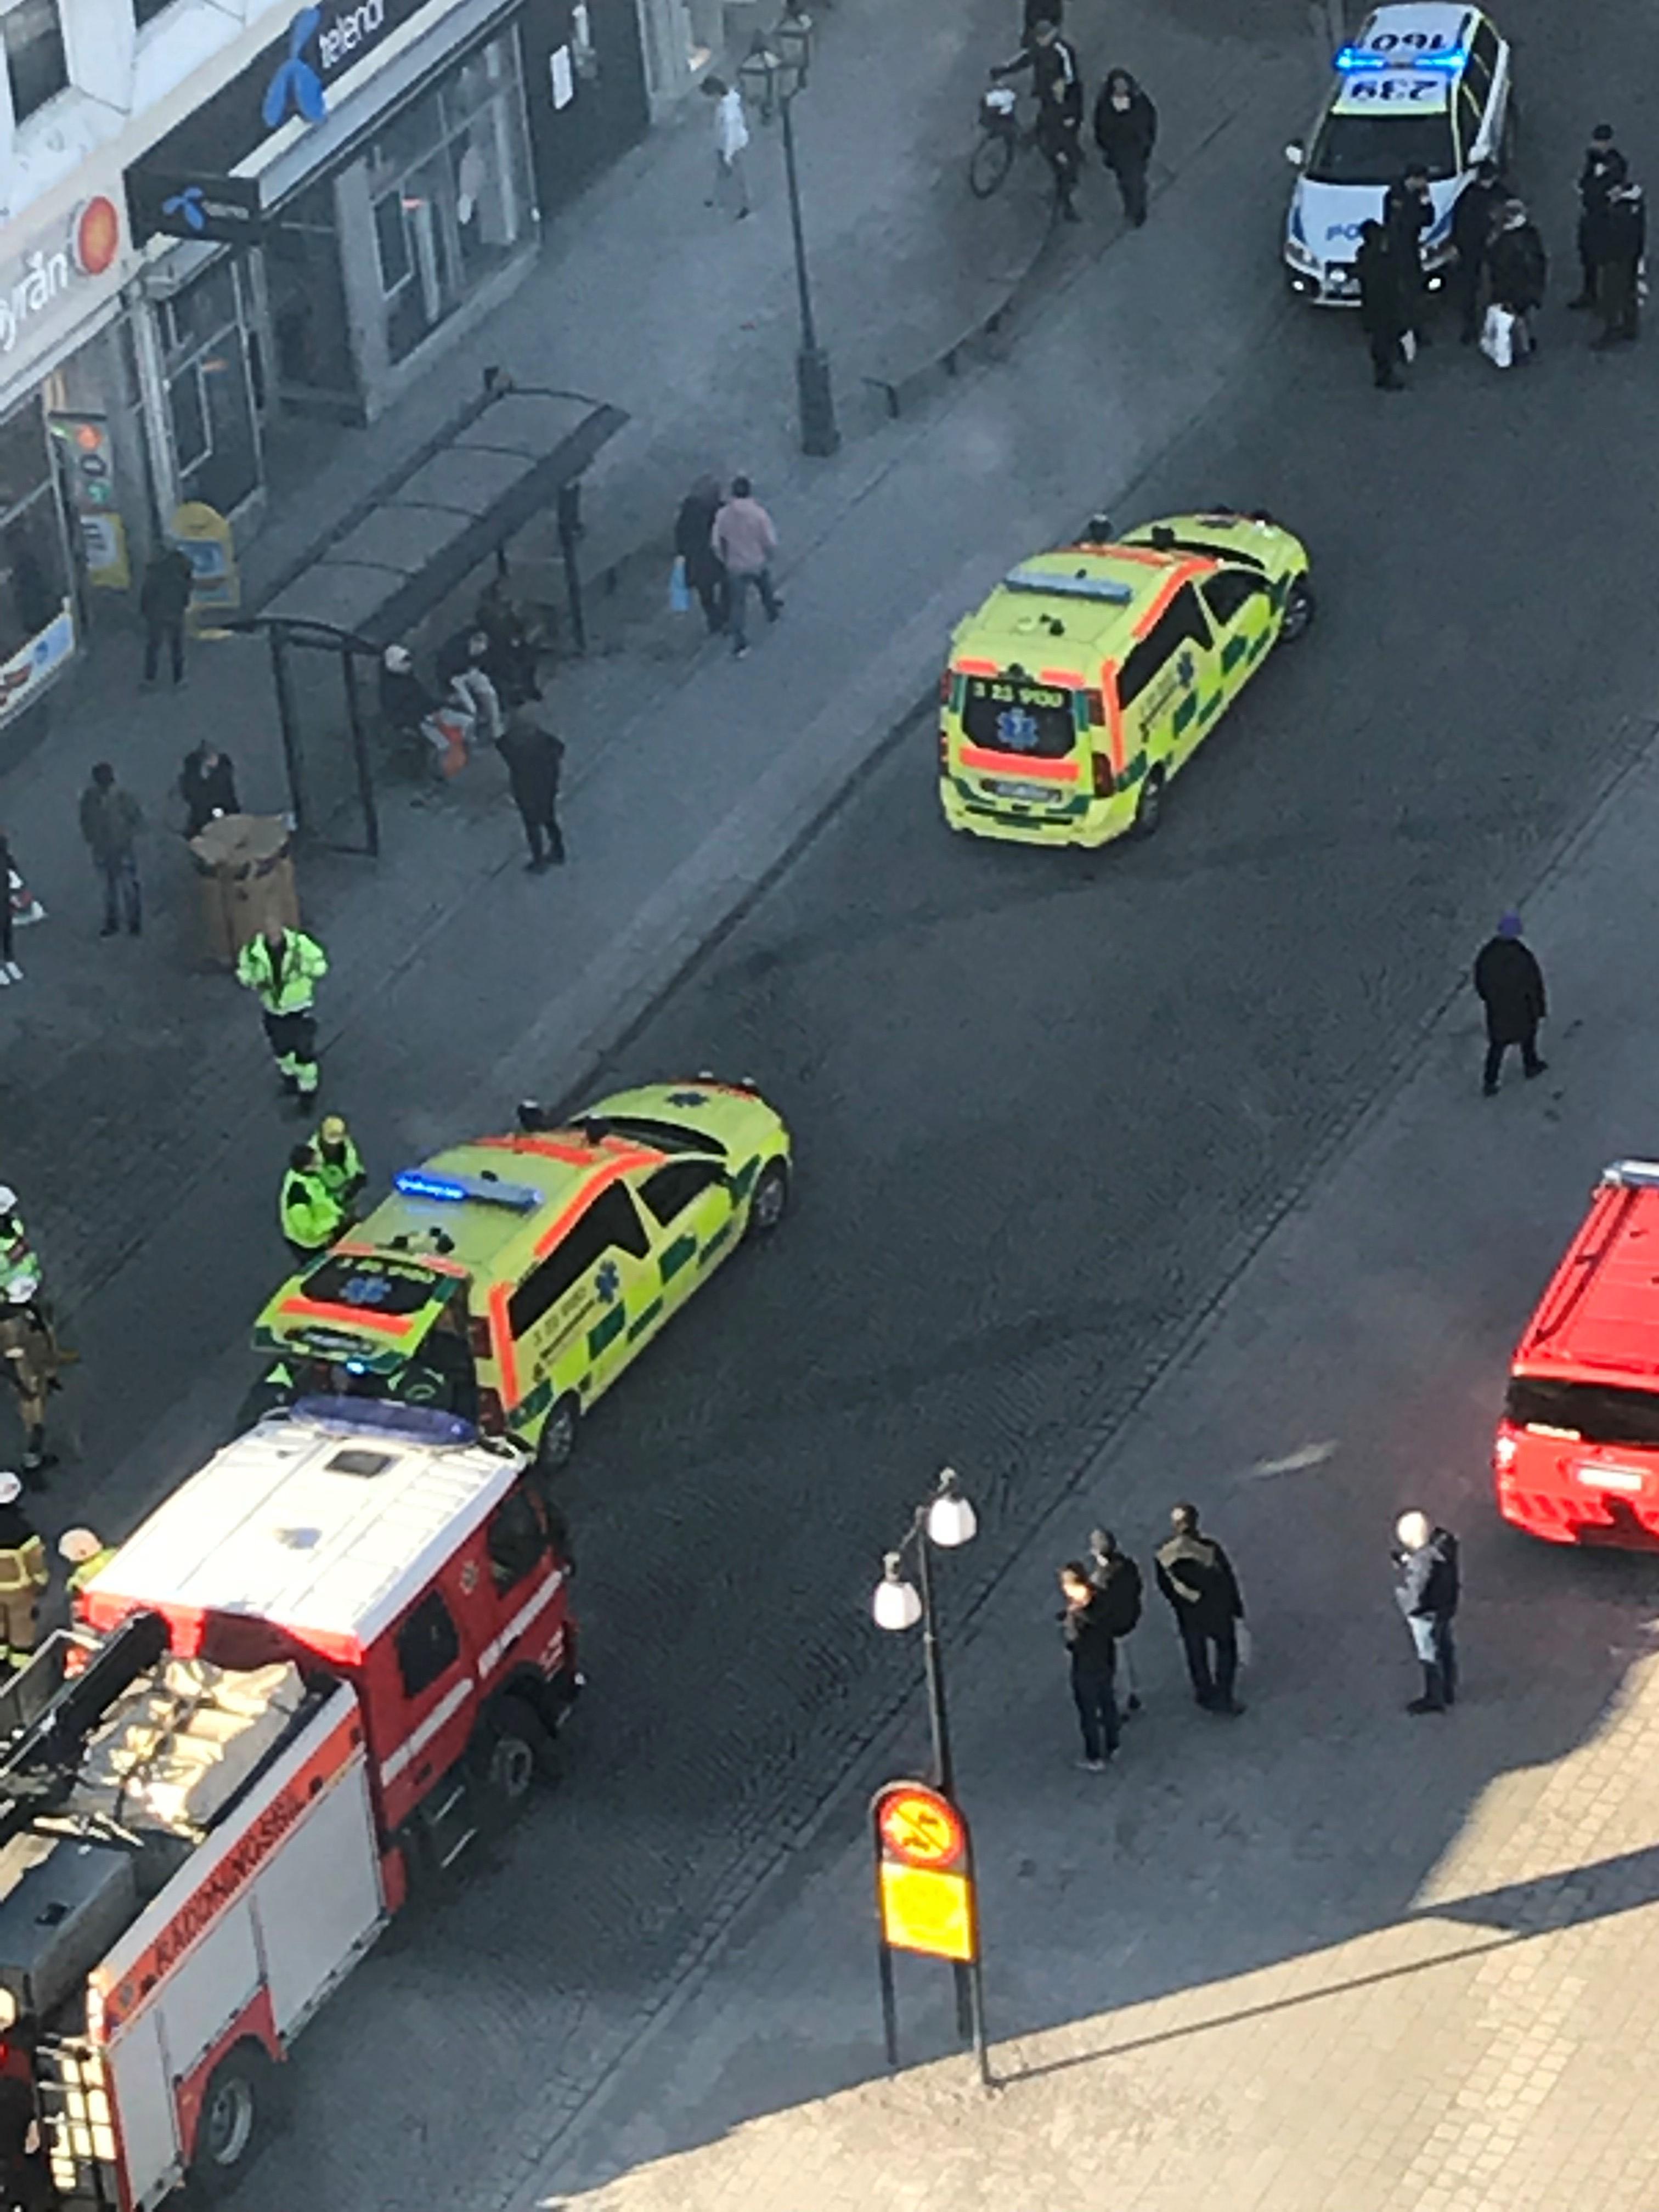 Krock pa e18 en ford till sjukhus